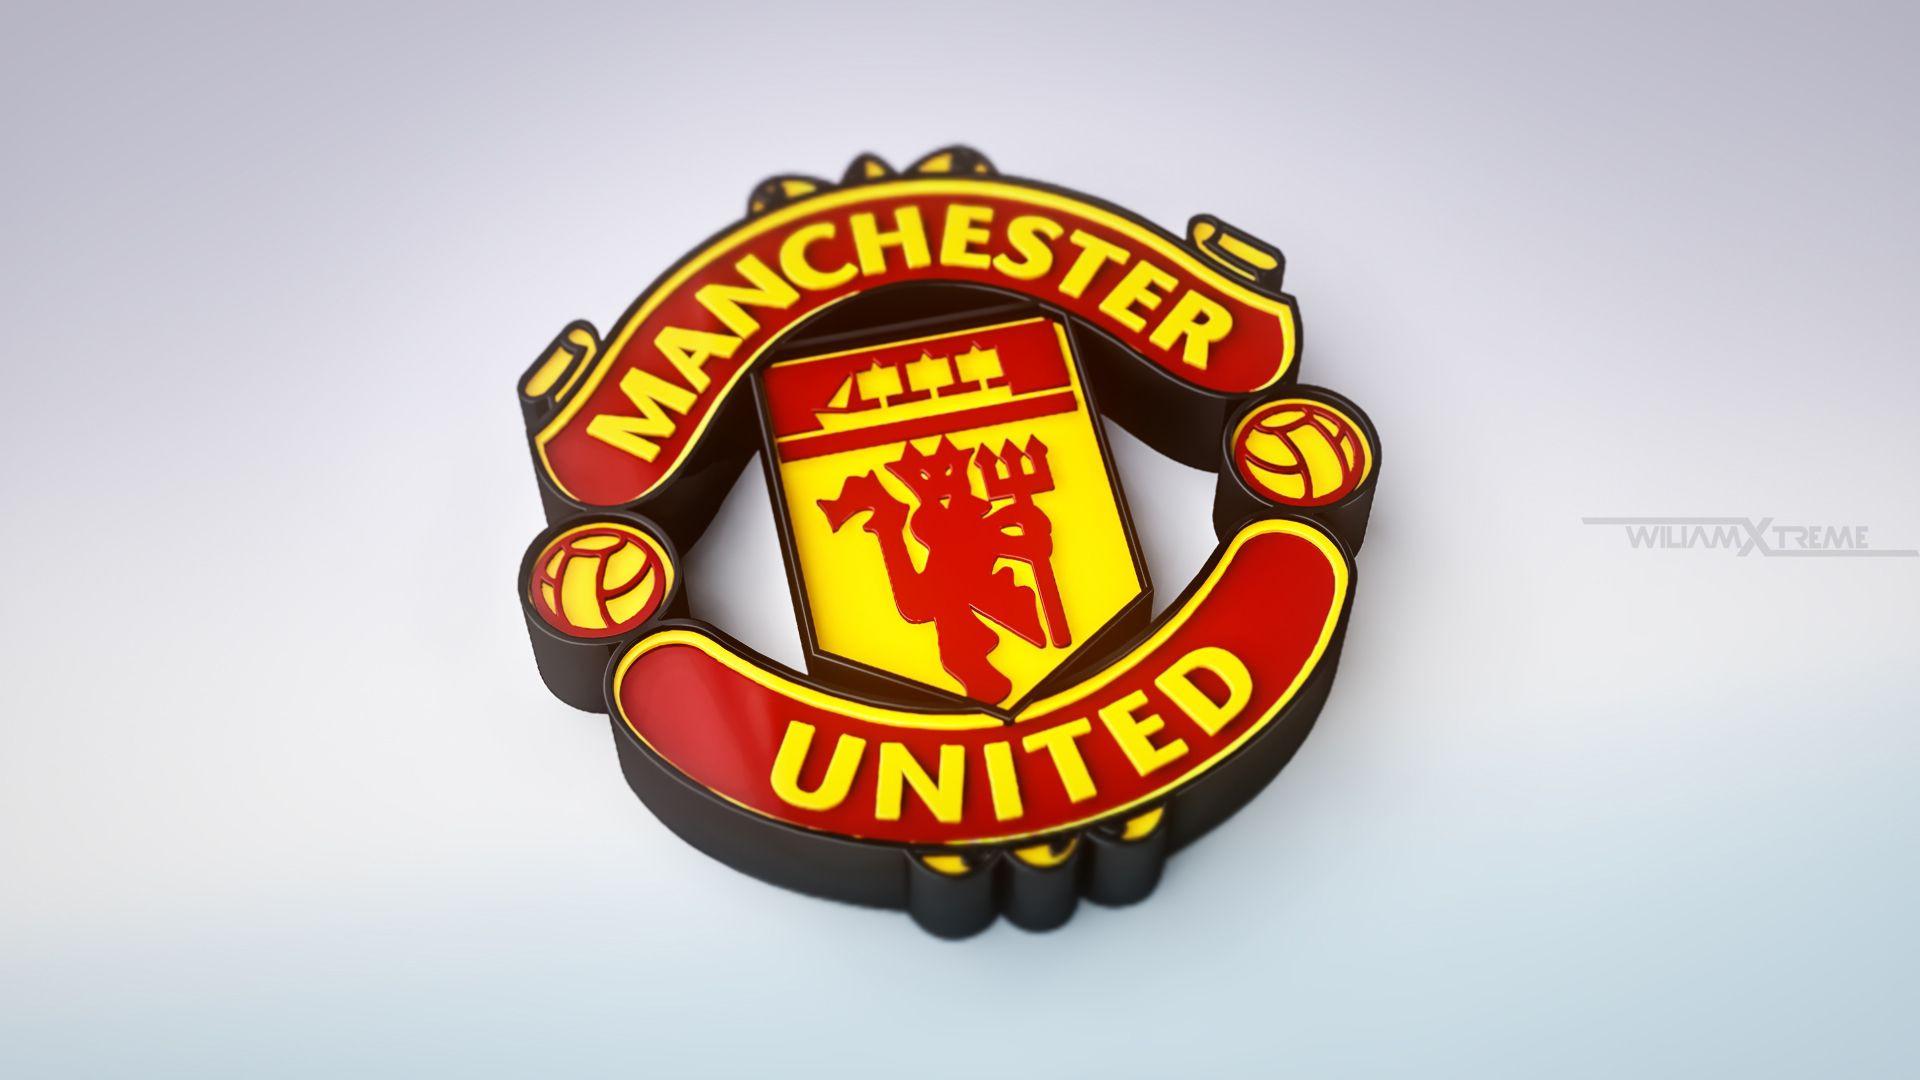 … Manchester United Logo Wallpaper Manchester United Logo Wallpapers Hd  2016 – Wallpaper …